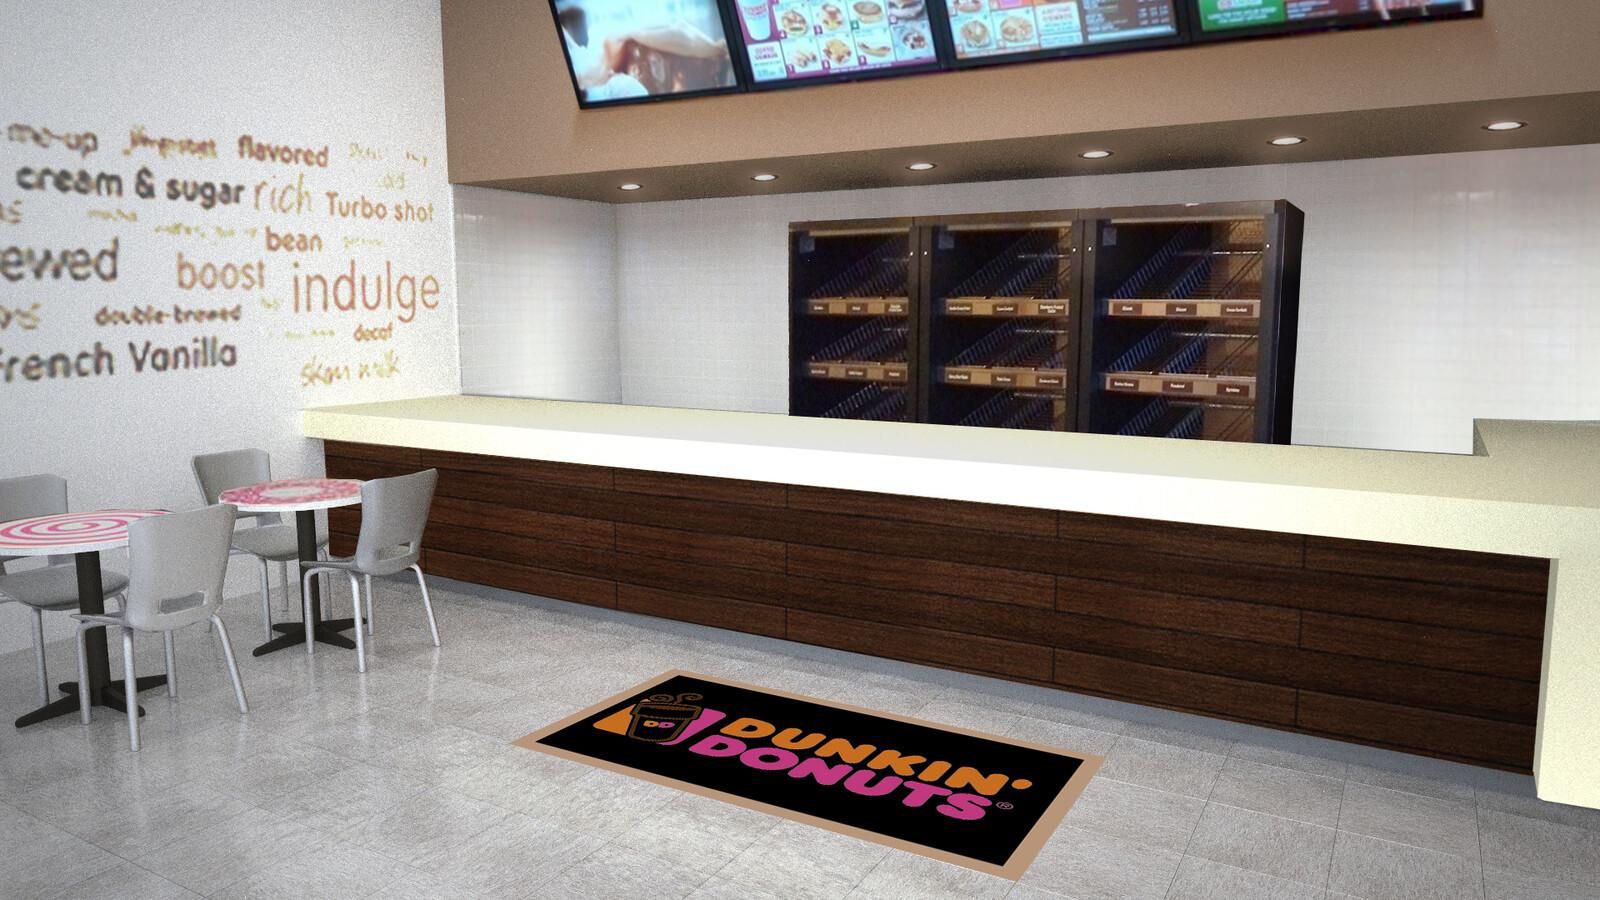 Dunkin Donuts set design